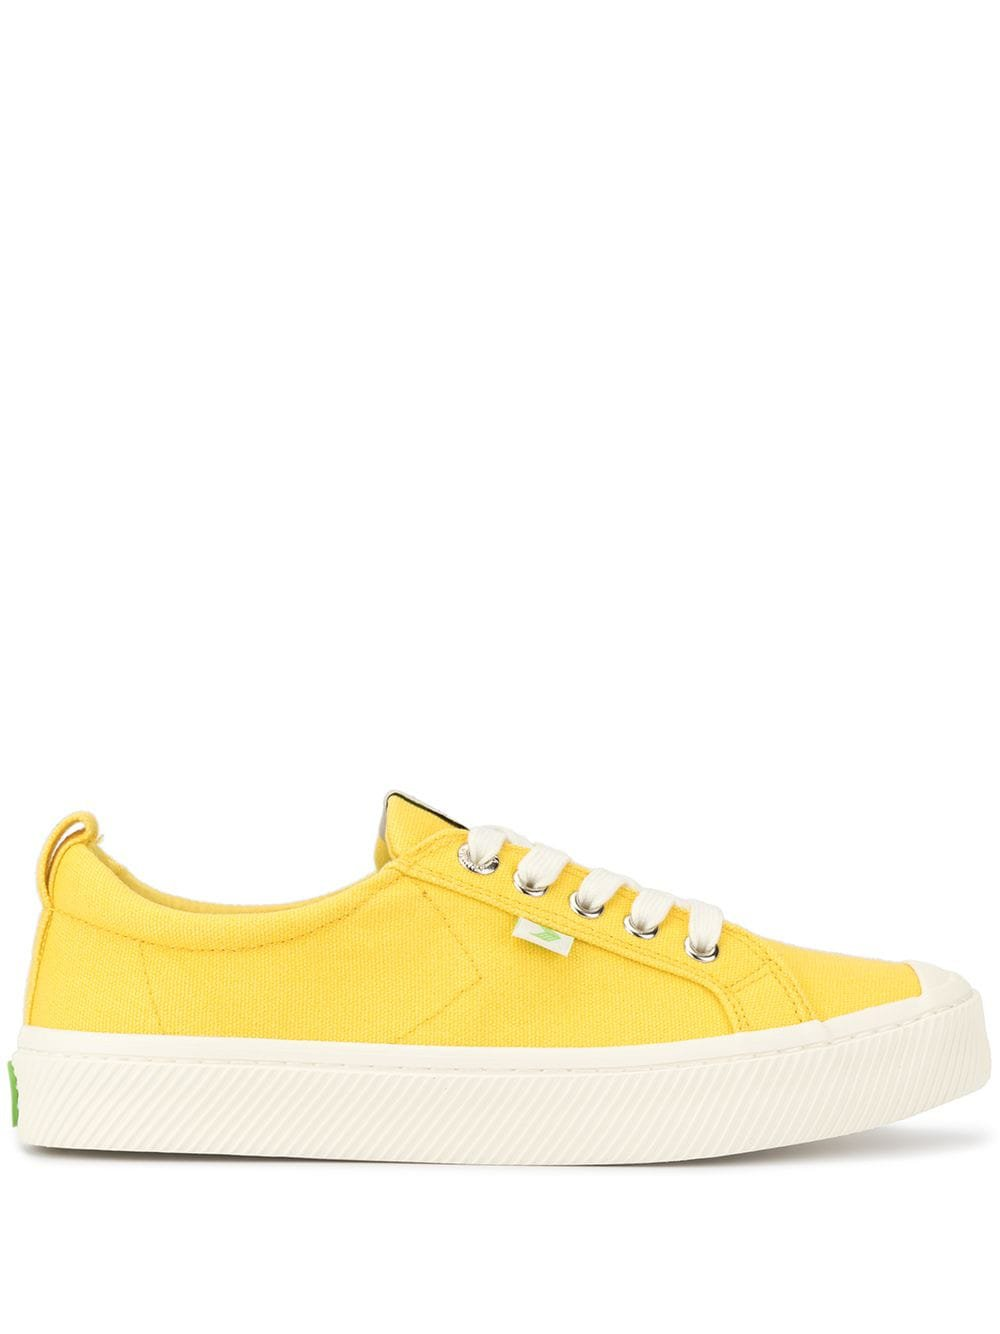 Cariuma Oca Low Yellow Canvas Sneakers